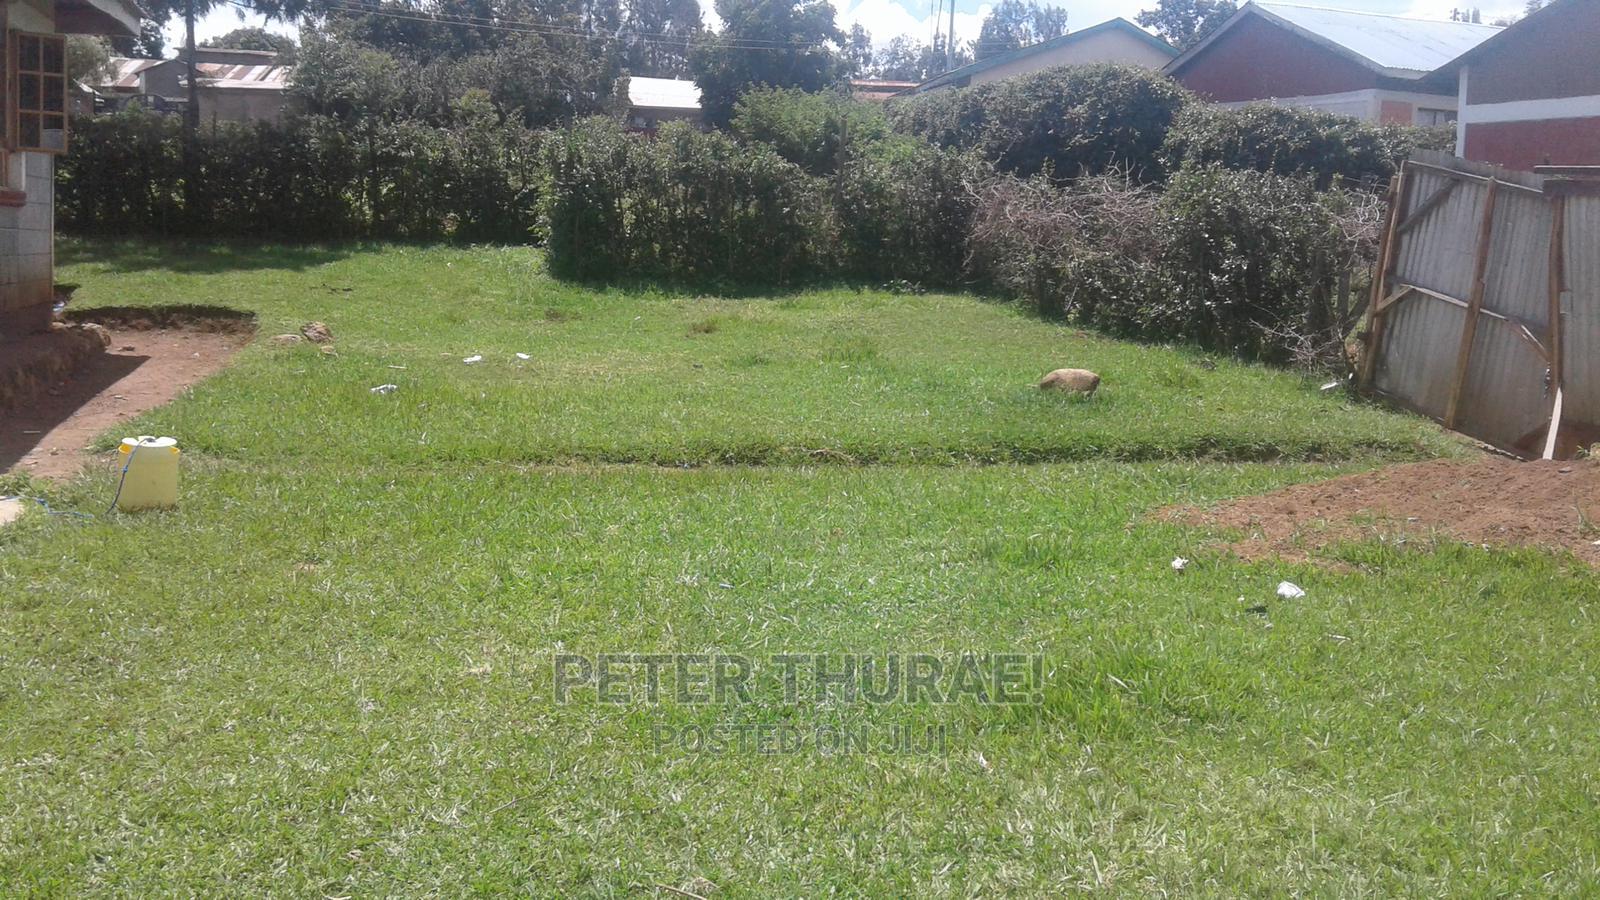 Residential Property For Sale | Commercial Property For Sale for sale in Central Kamagambo, Migori, Kenya